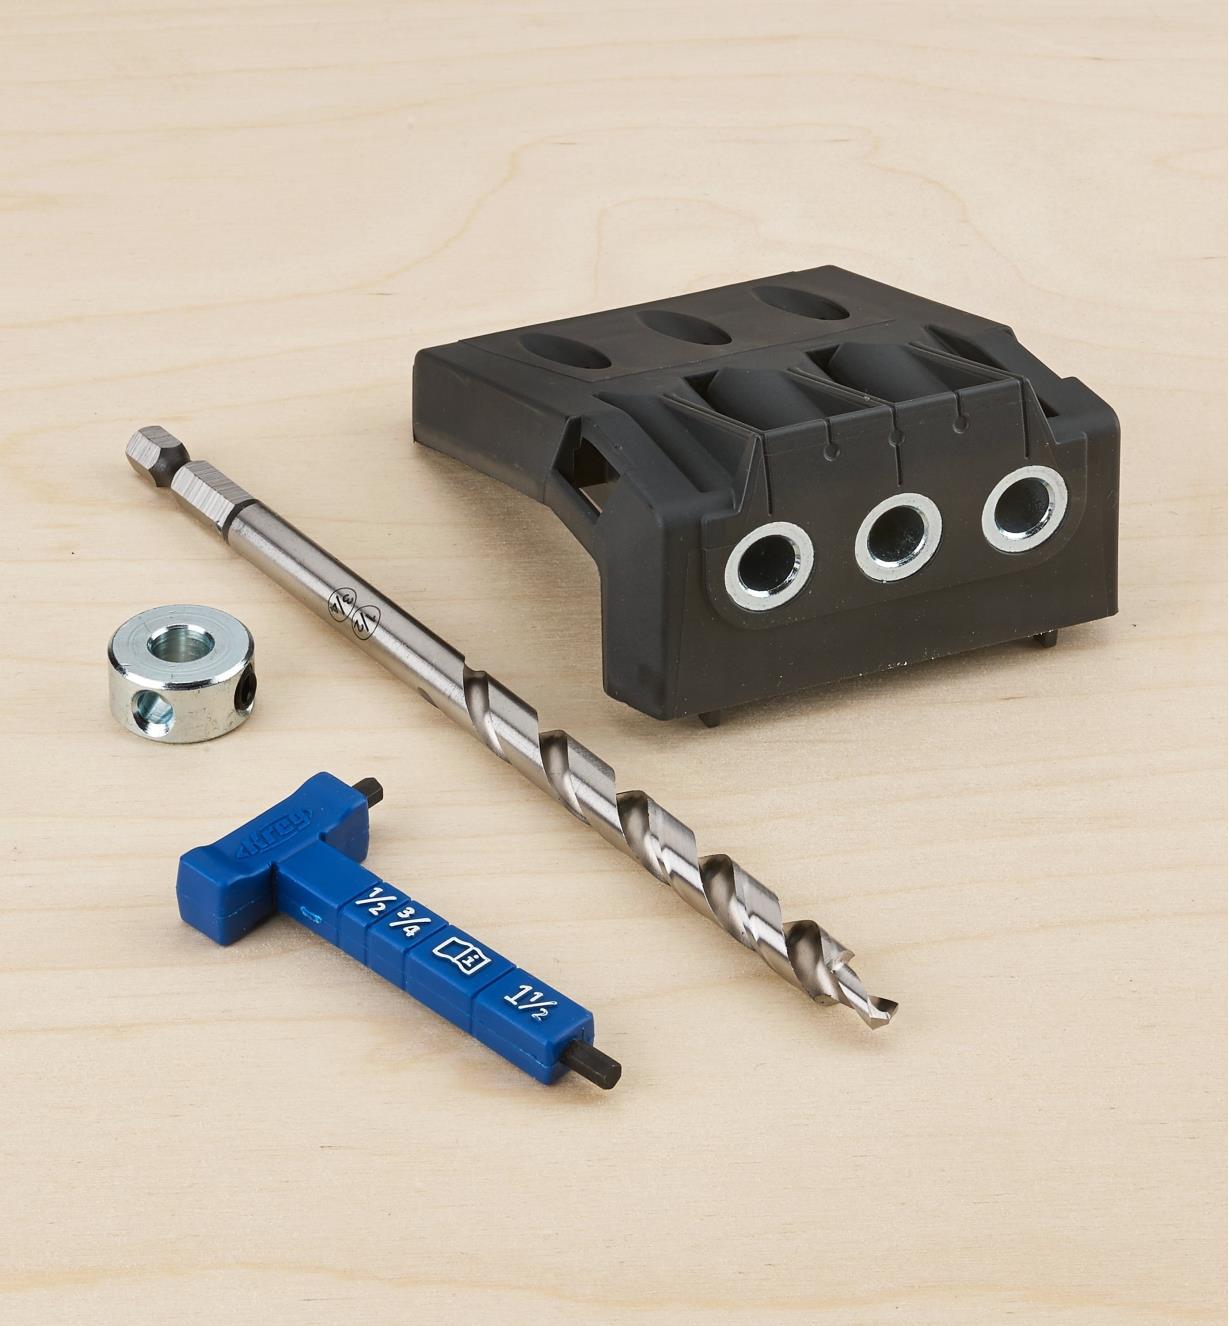 25K6197 - Kreg 730 Micro-Pocket Drill Guide